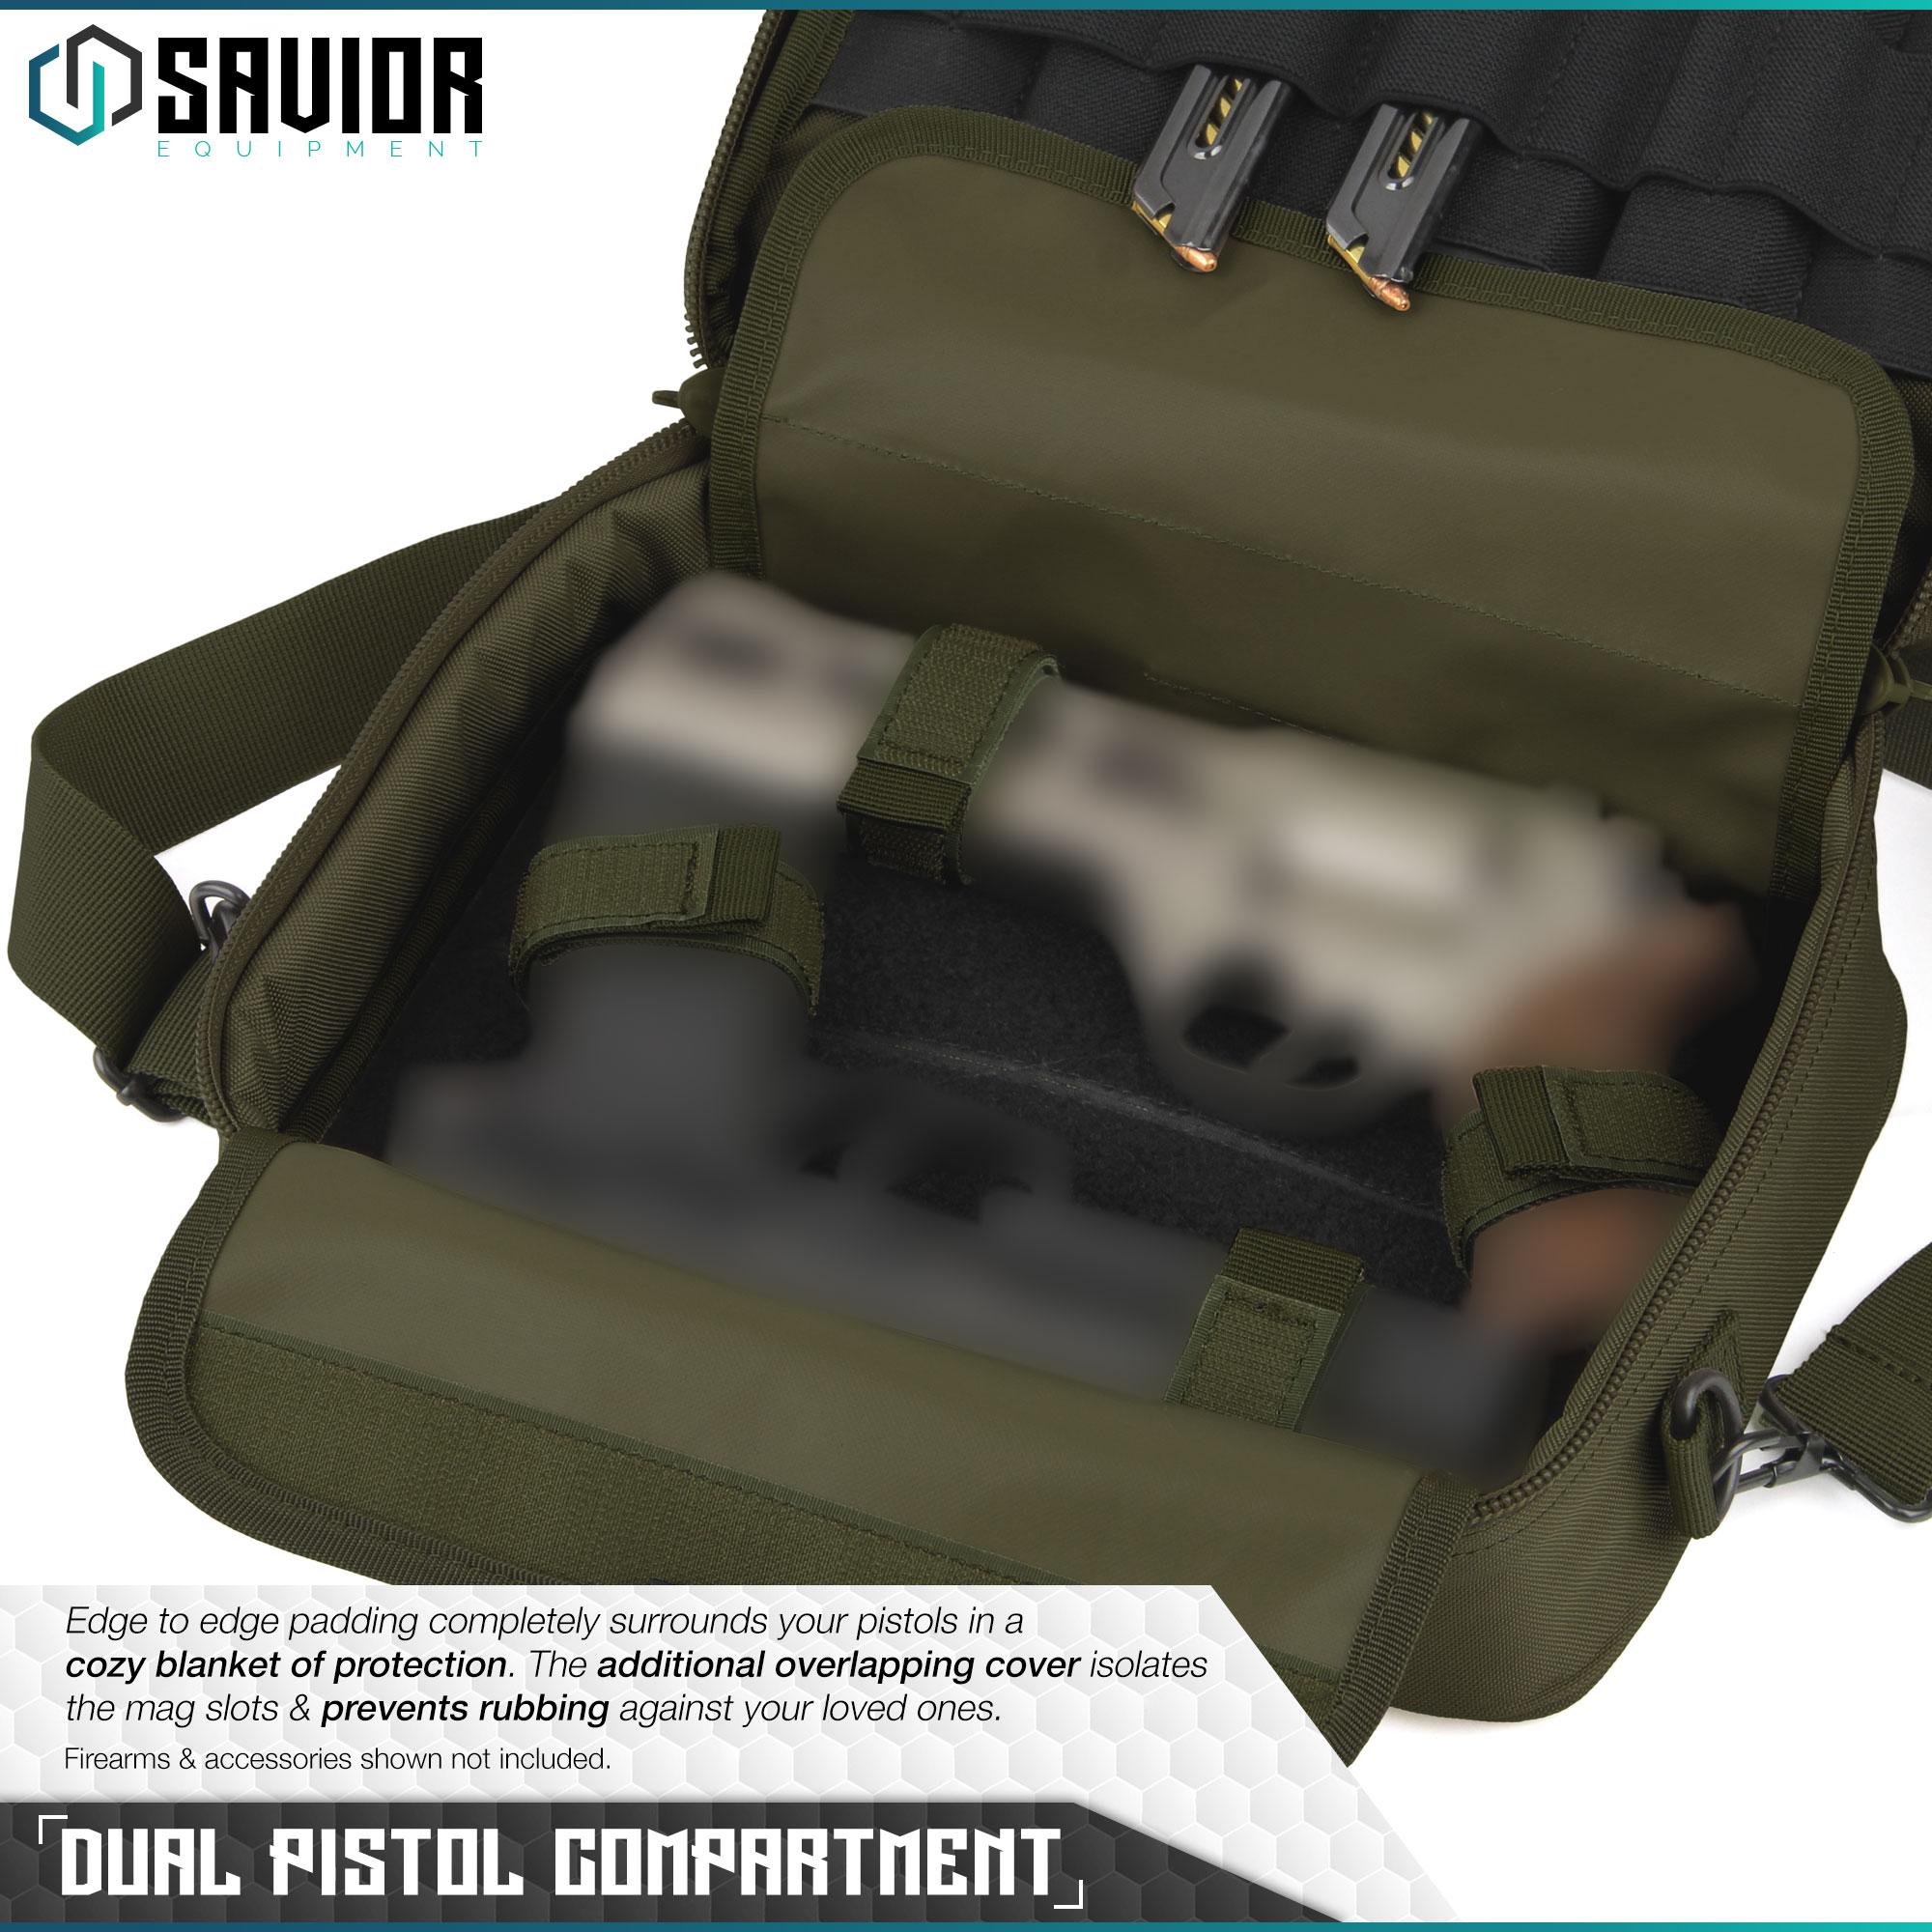 thumbnail 21 - 034-SAVIOR-034-Padded-Discreet-Double-Handgun-Bag-Pistol-Storage-Case-w-Mag-Pouch-Slot